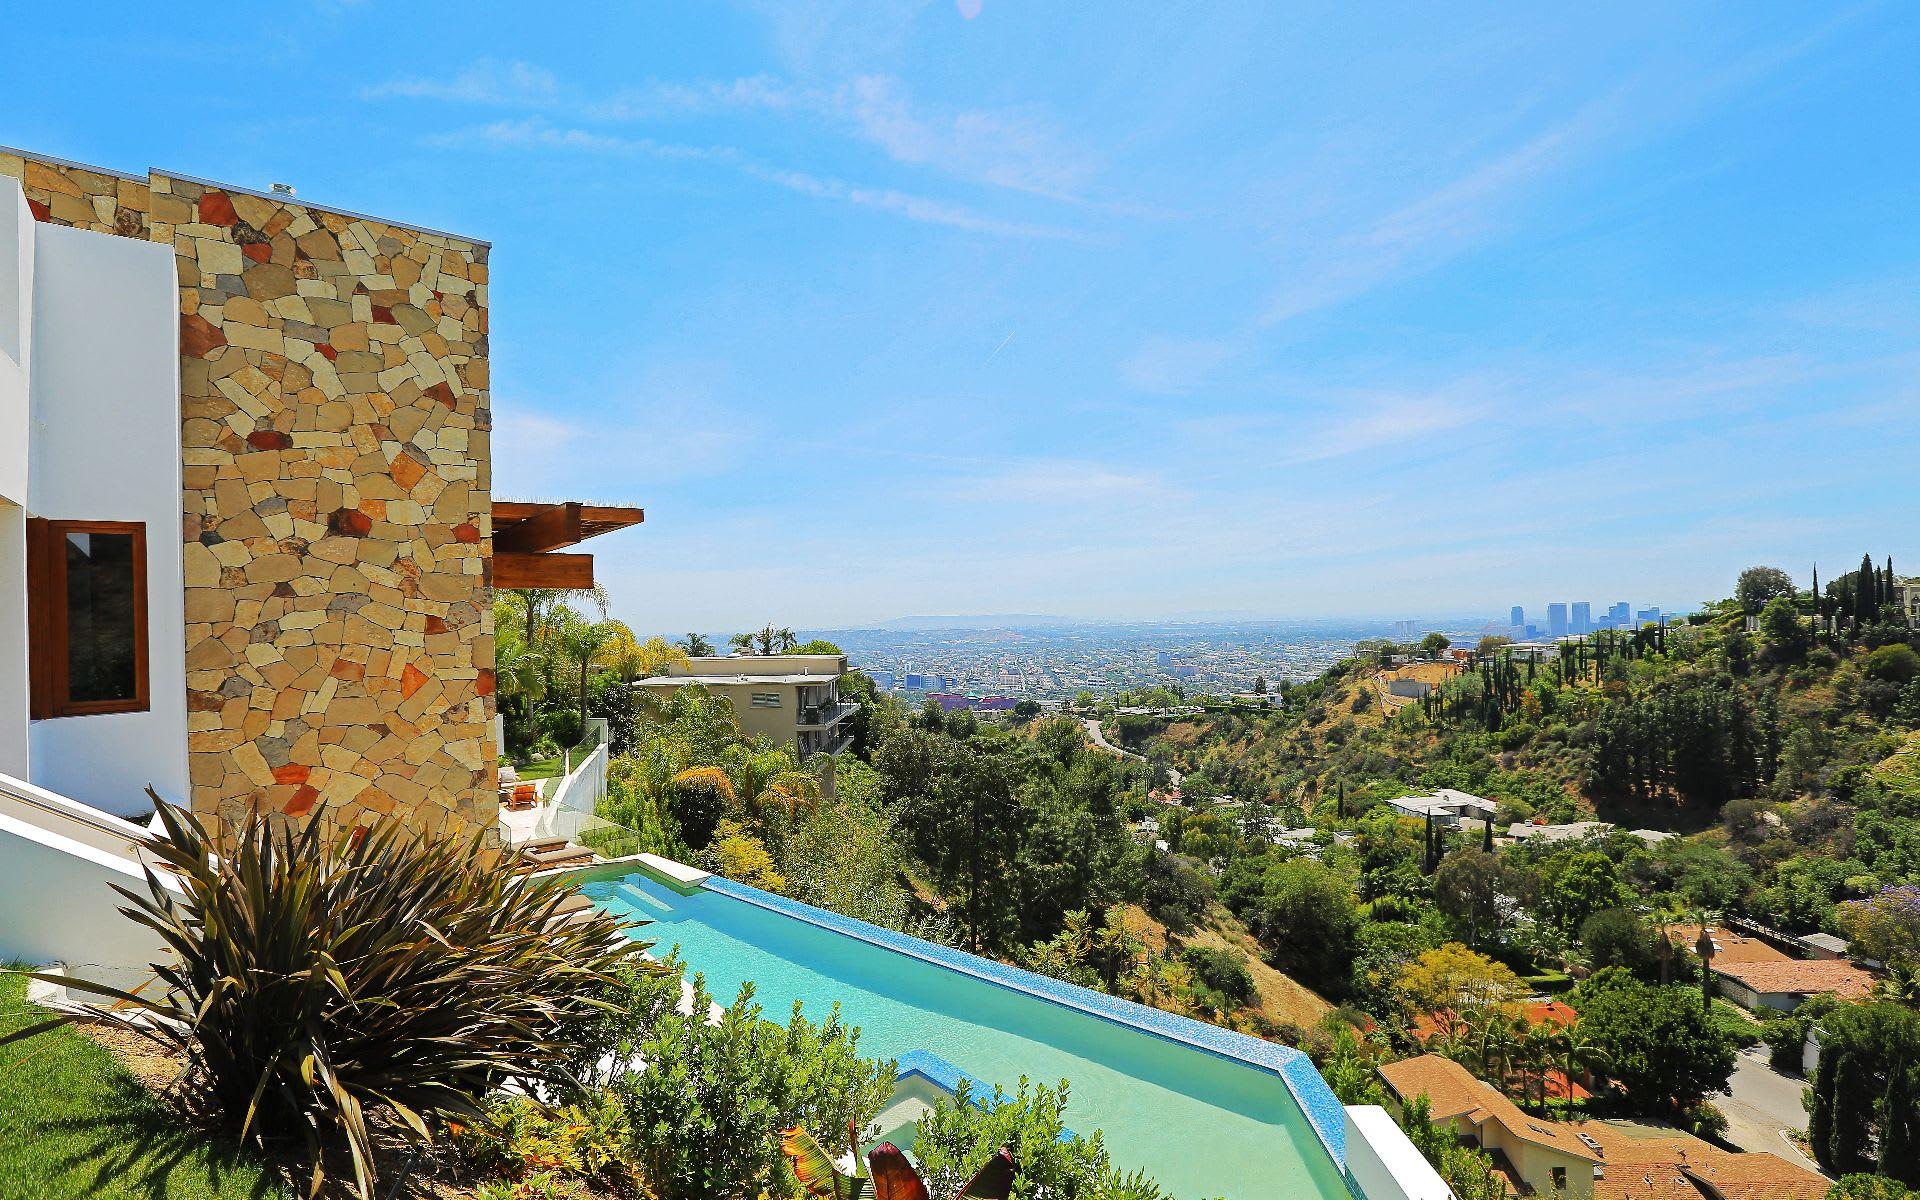 Additional photo for property listing at 1551 Viewsite Dr 1551 Viewsite Dr Los Angeles, Καλιφορνια,90069 Ηνωμενεσ Πολιτειεσ